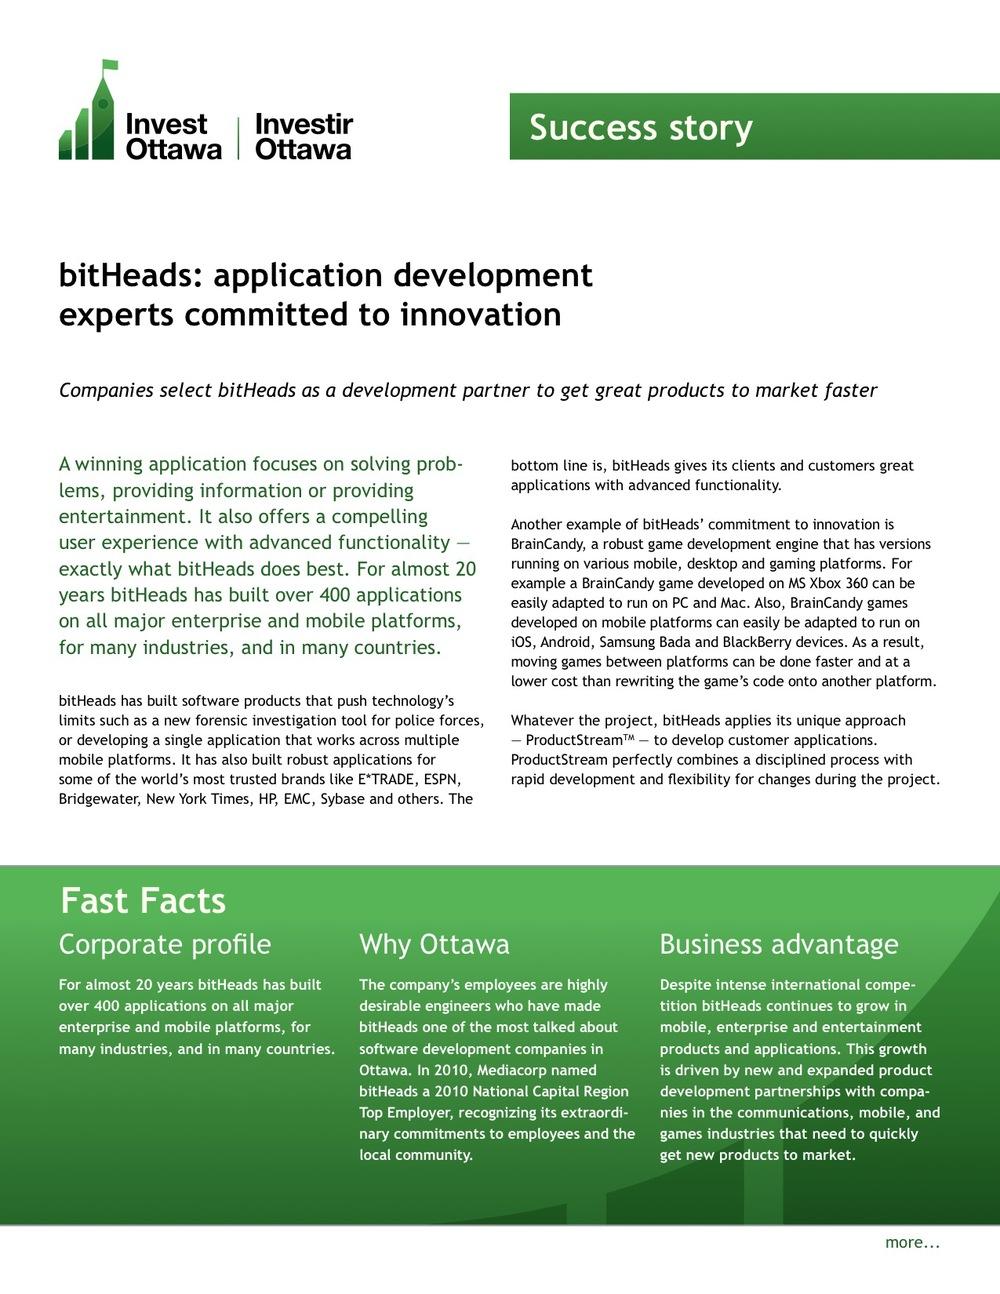 InvestOttawa-BitHeads-VIEW-page1.jpg